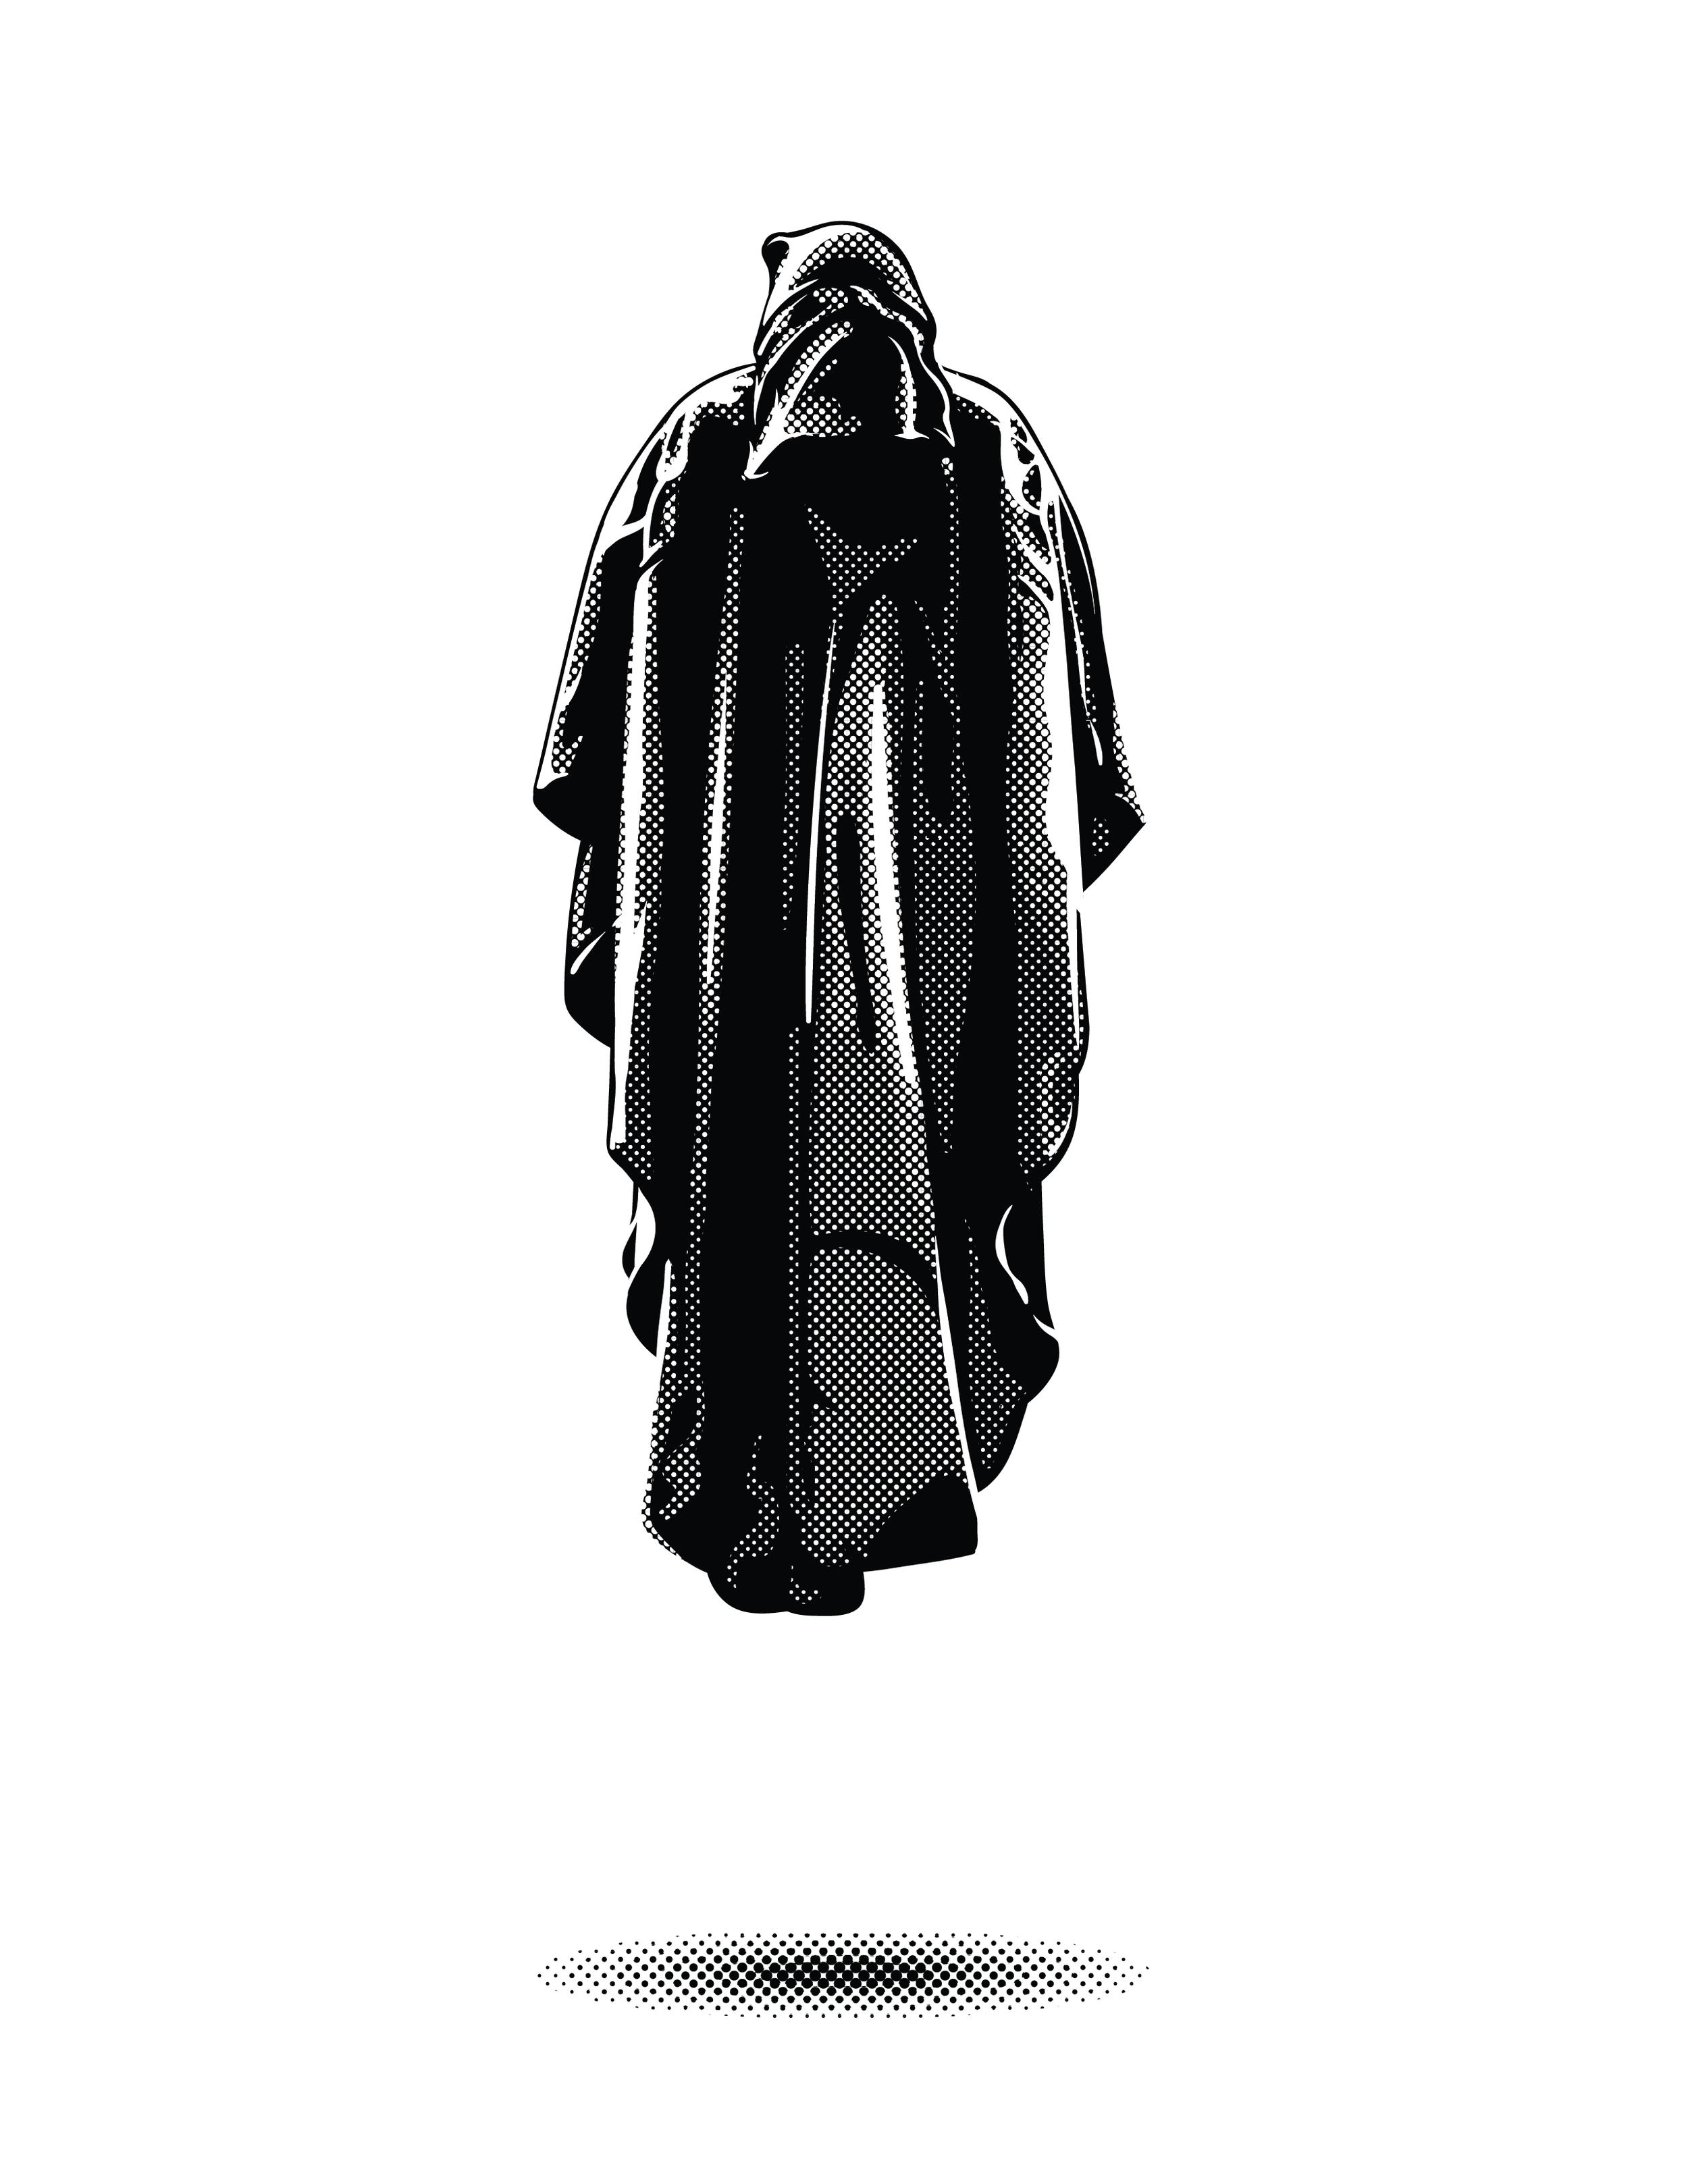 Hover Reaper